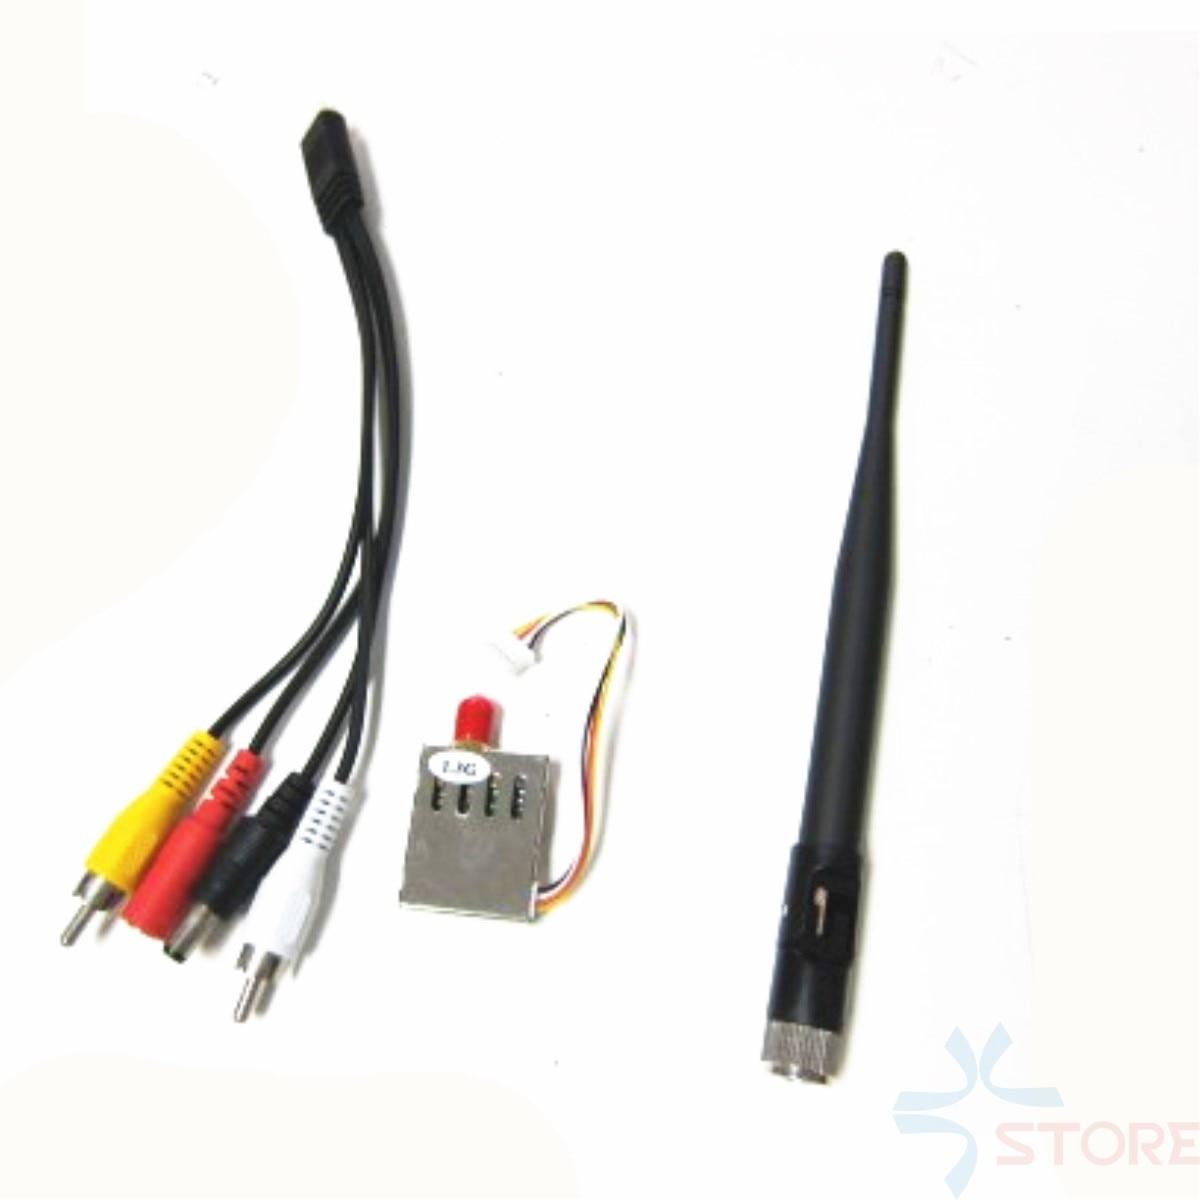 1.2G/1.3G 4CH 200mw Wireless Audio Video 1.240G 1.280G 1.320G 1.360G Video Transmitter Tx for FPV